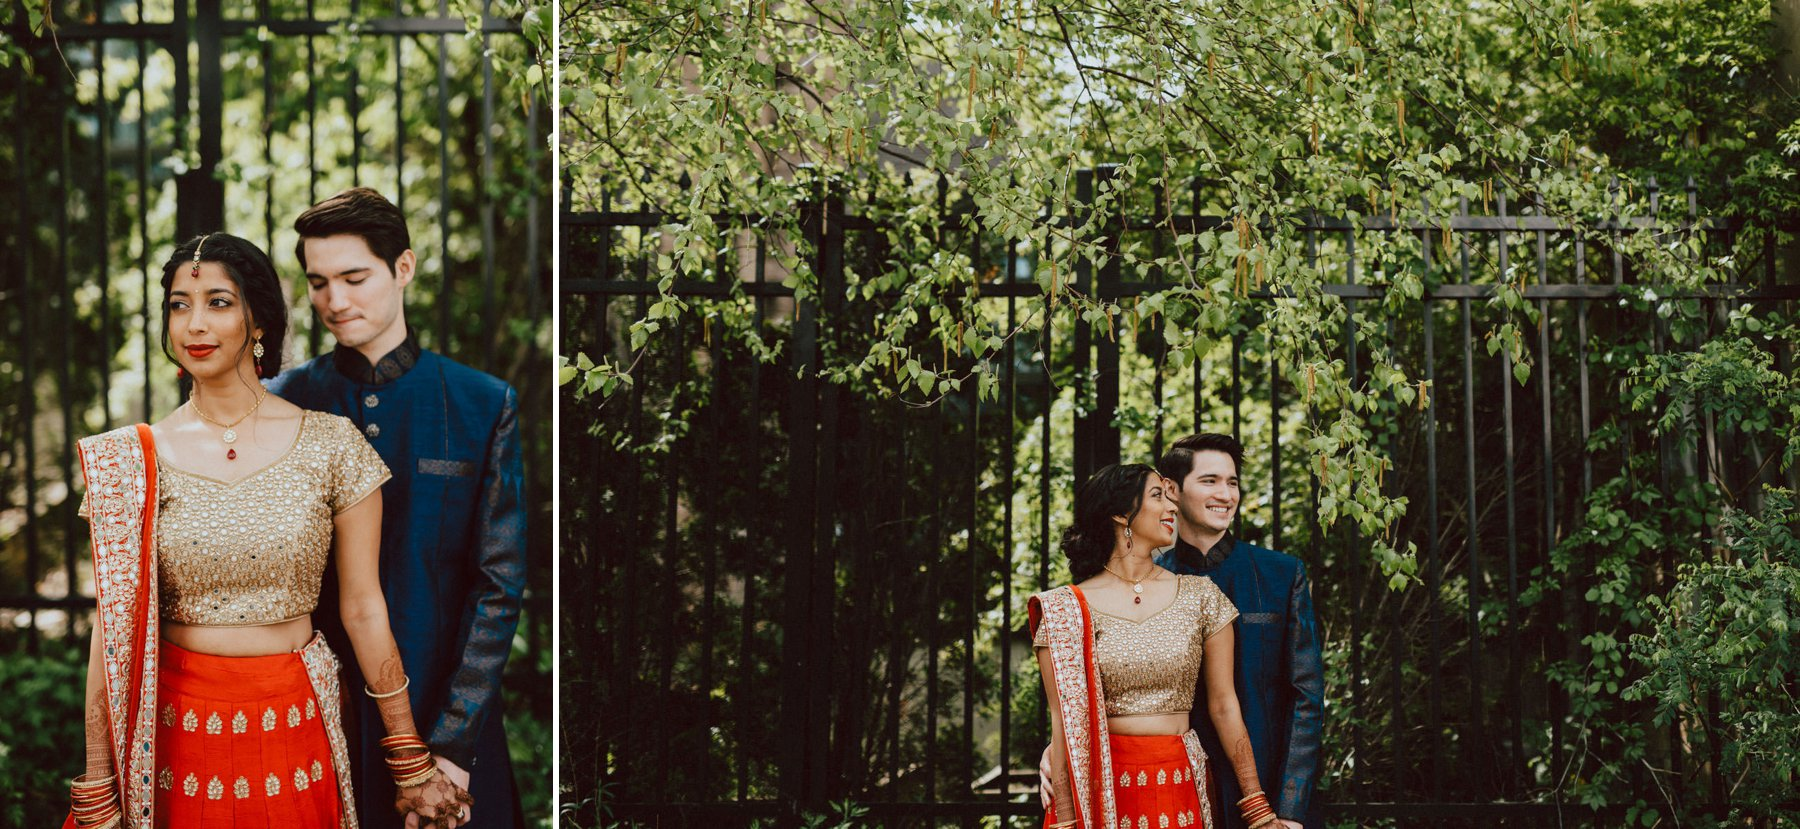 vie-philadelphia-indian-wedding-44.jpg